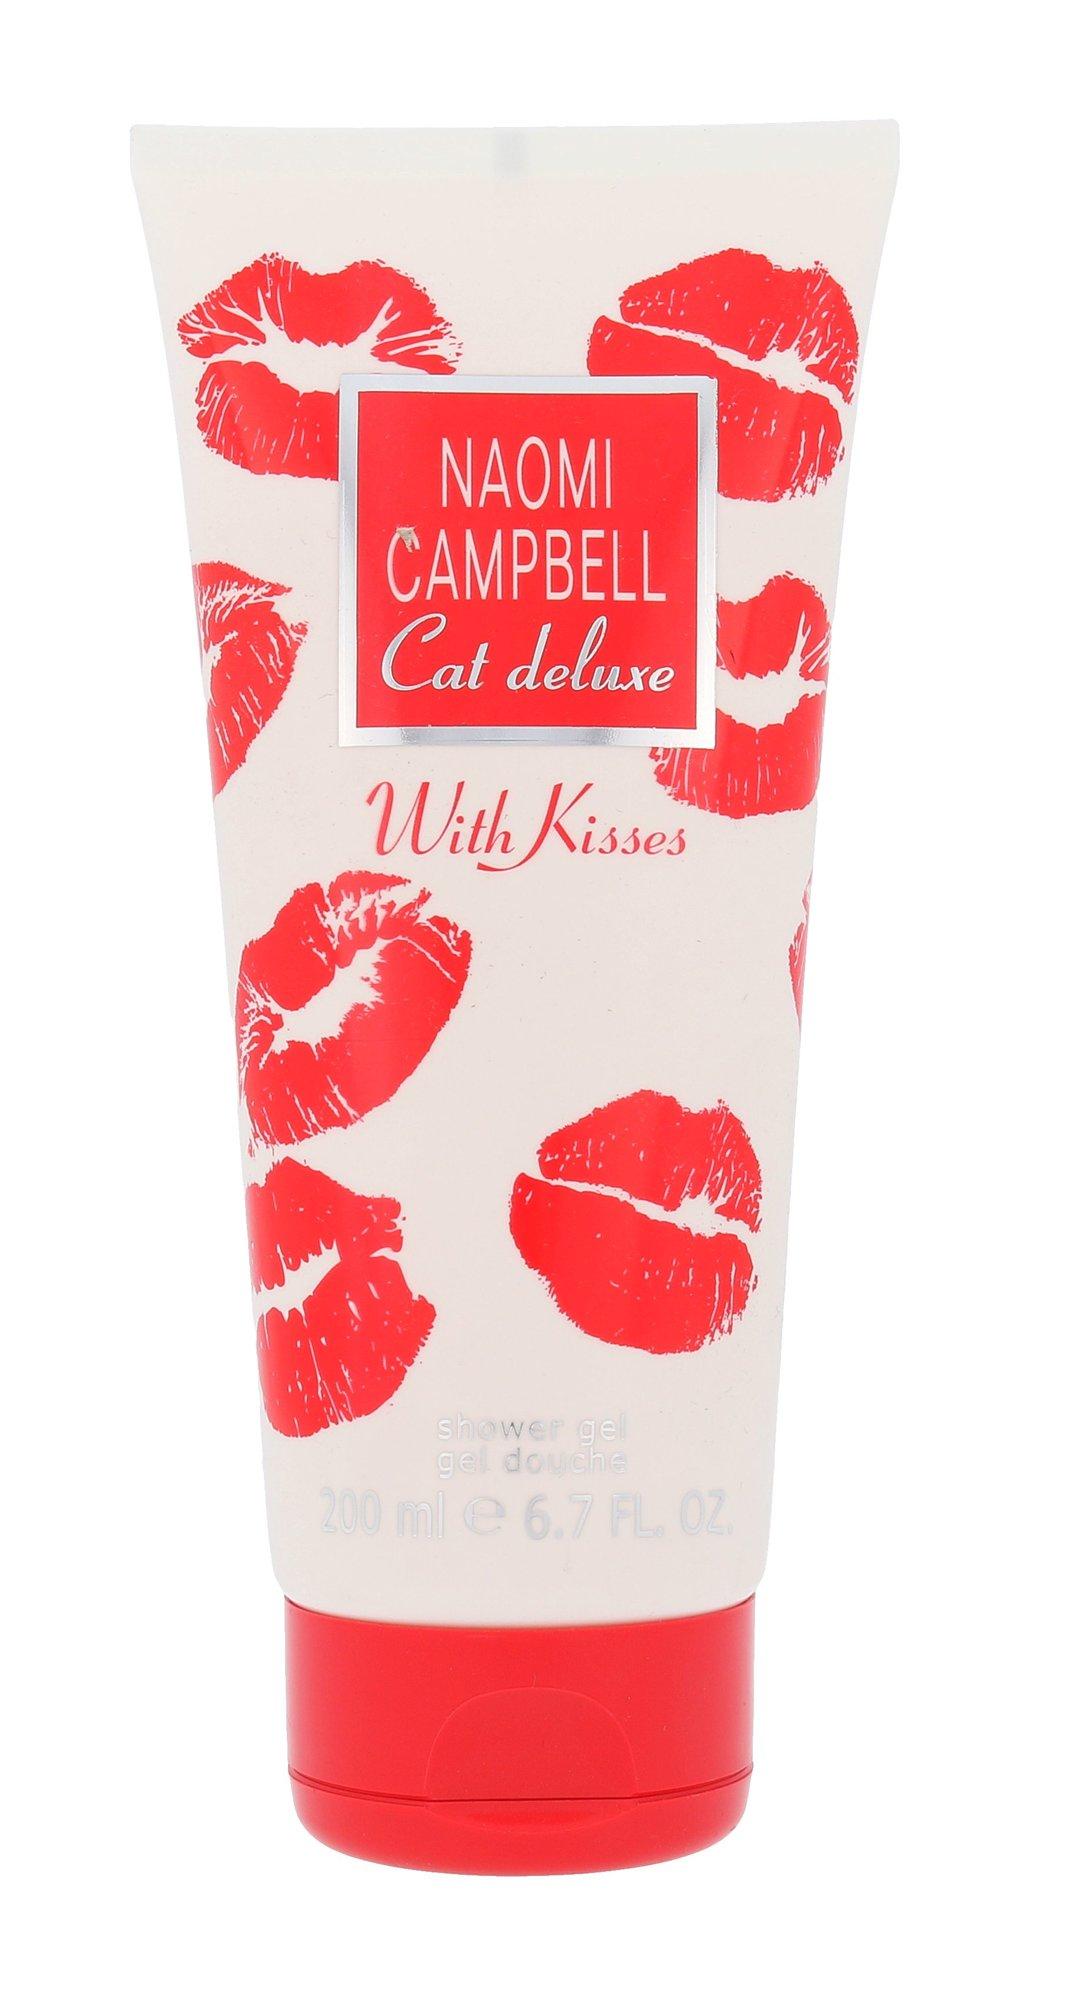 Naomi Campbell Cat Deluxe Shower gel 200ml